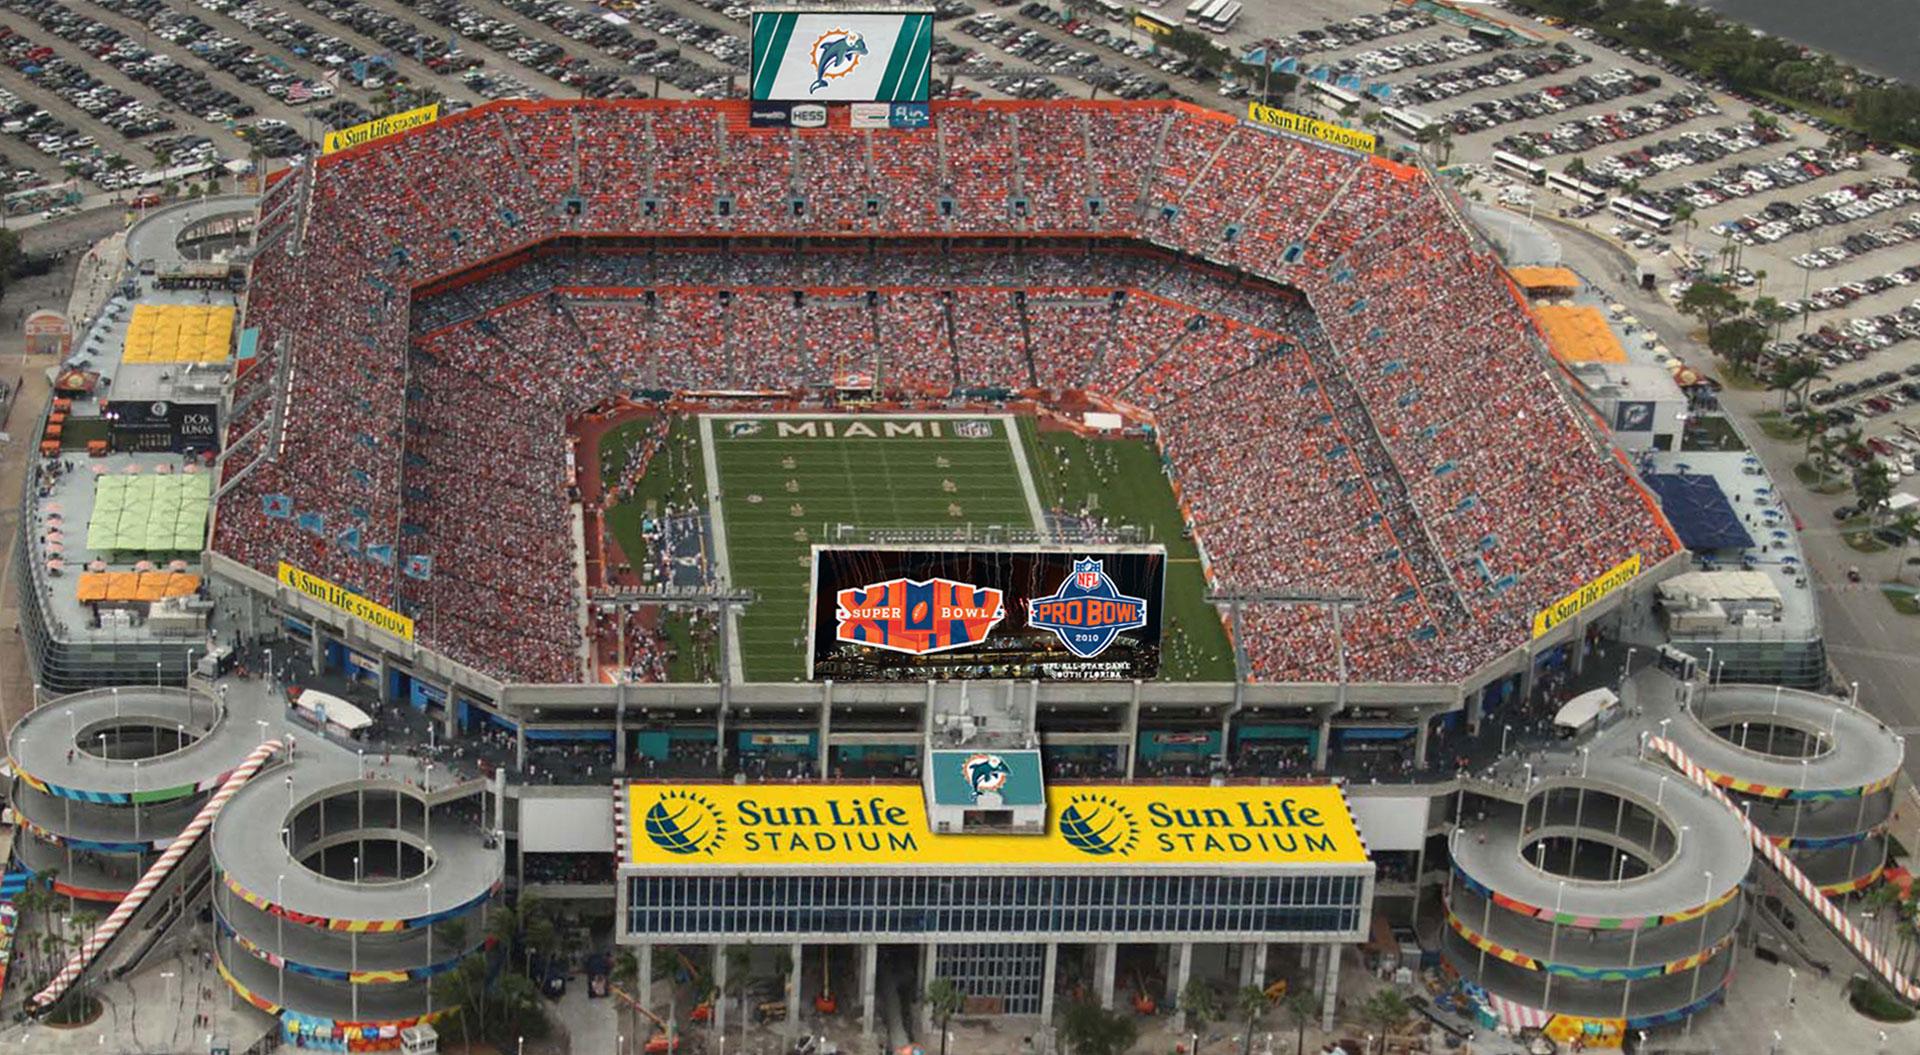 SLF_Stadium_cropped_Web_Big.jpg